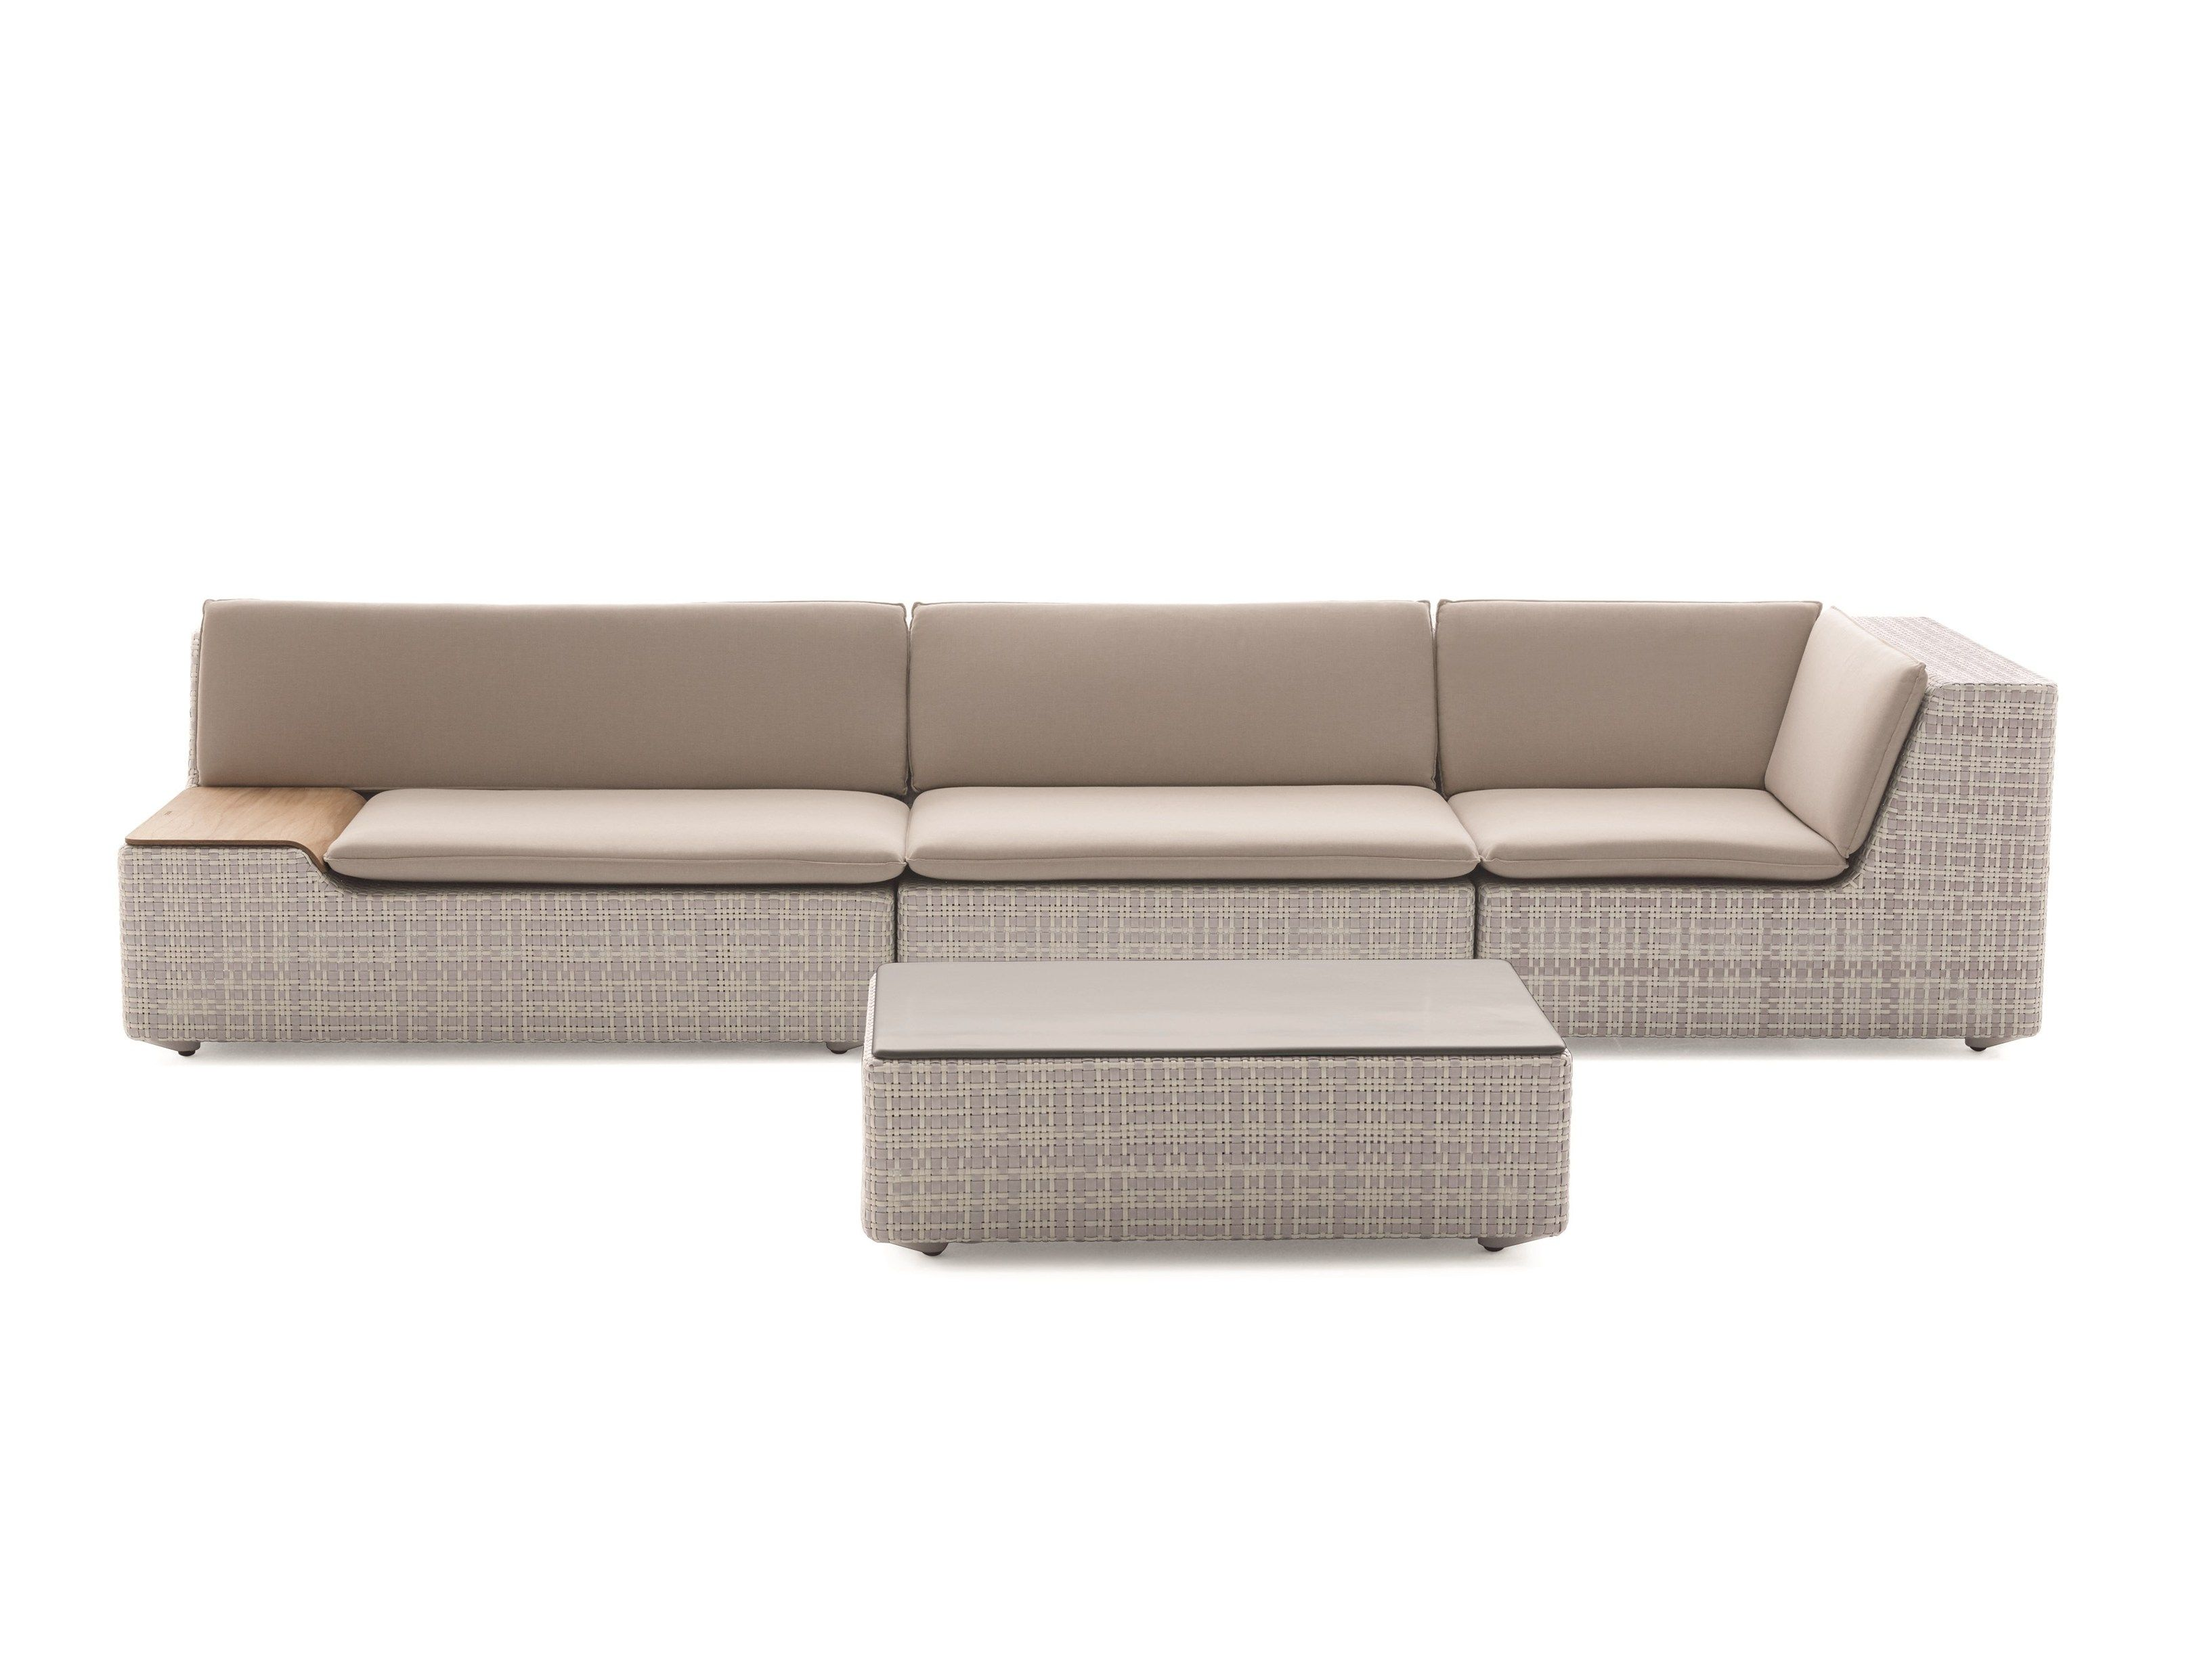 LOU Modular Sofa Lou Collection By Dedon Design Toan Nguyen